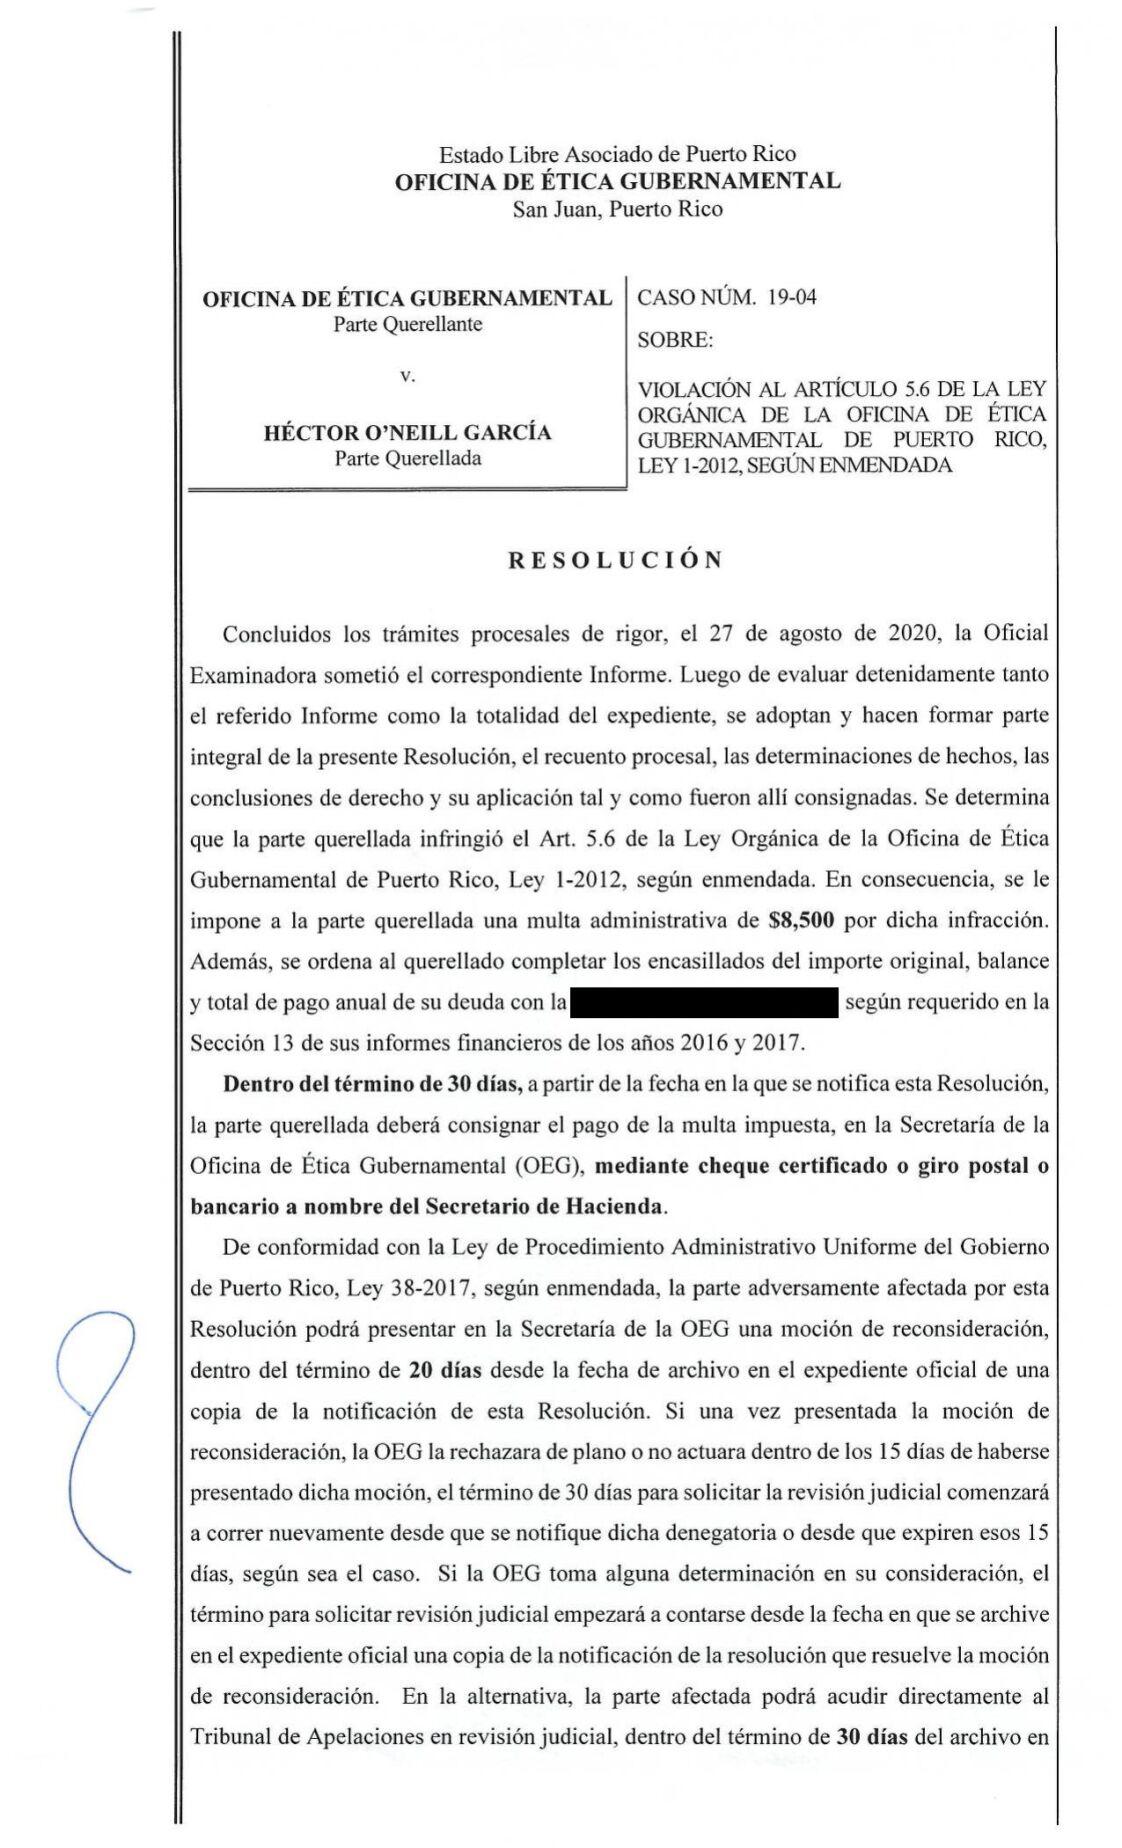 Multán a Héctor O'neil por no revelar sus informes financieros a la oficina de Ética